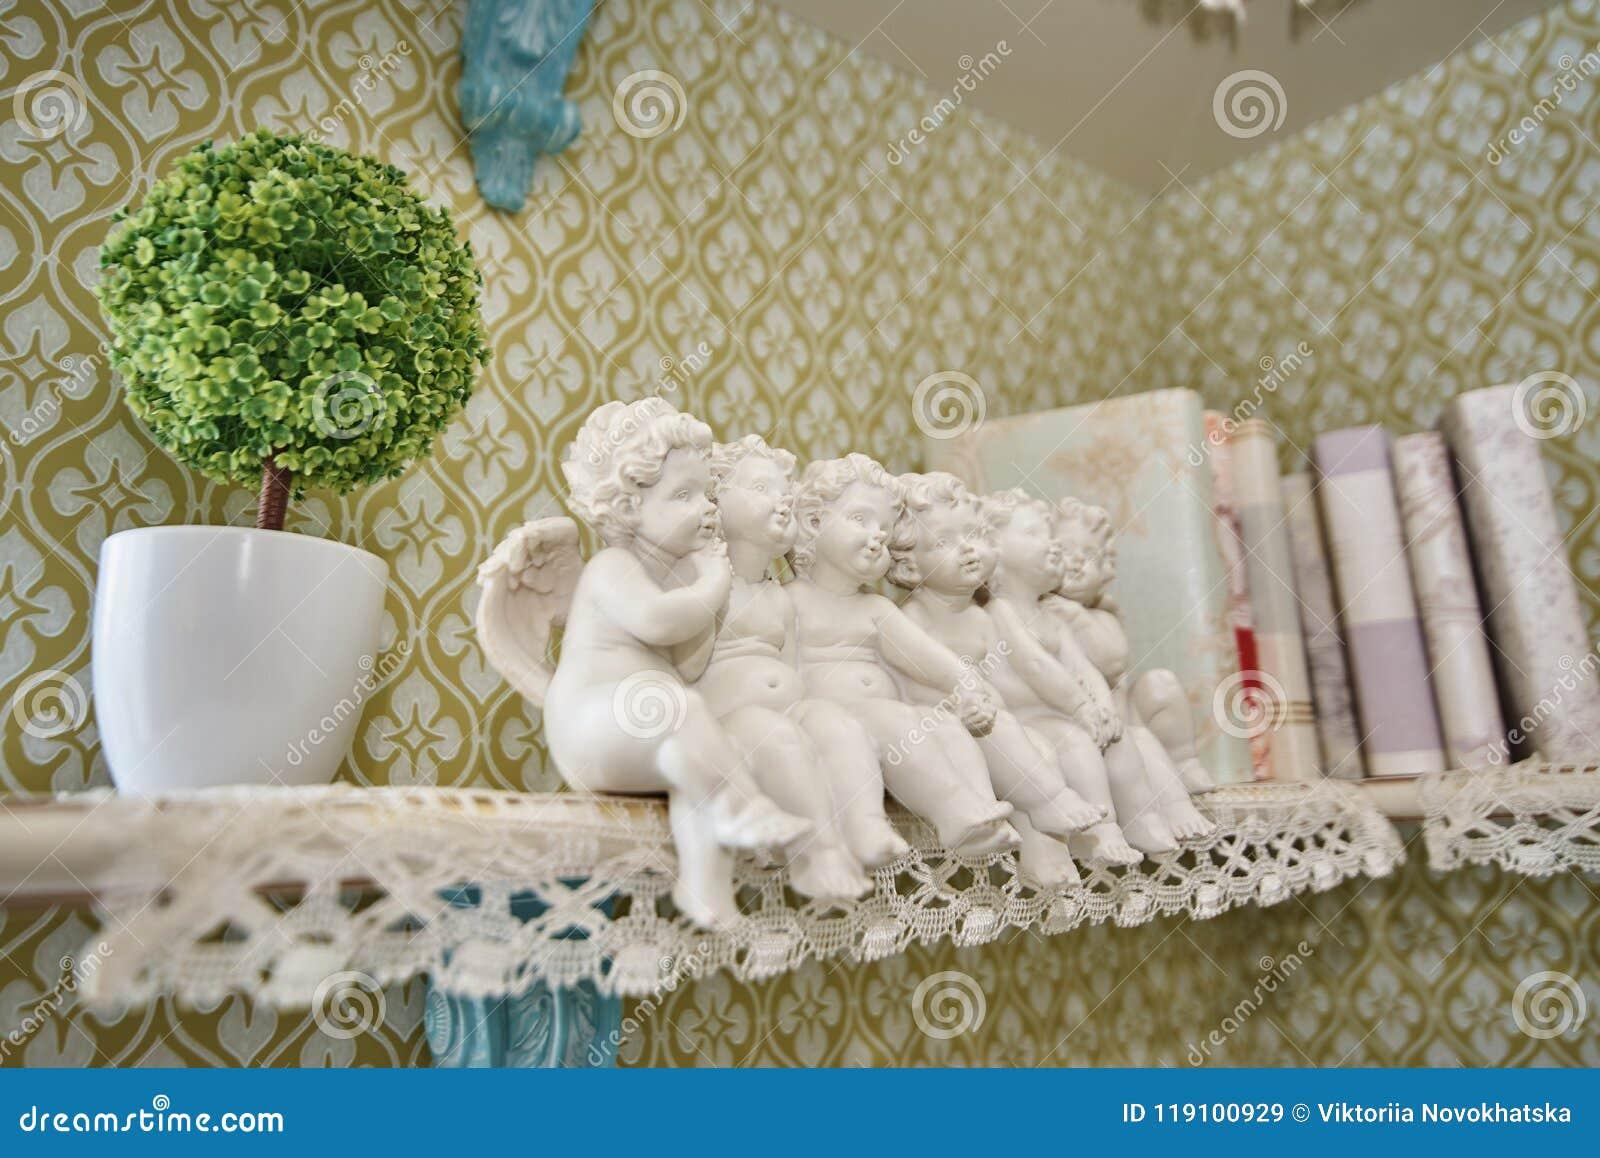 A statuette of little cute angels